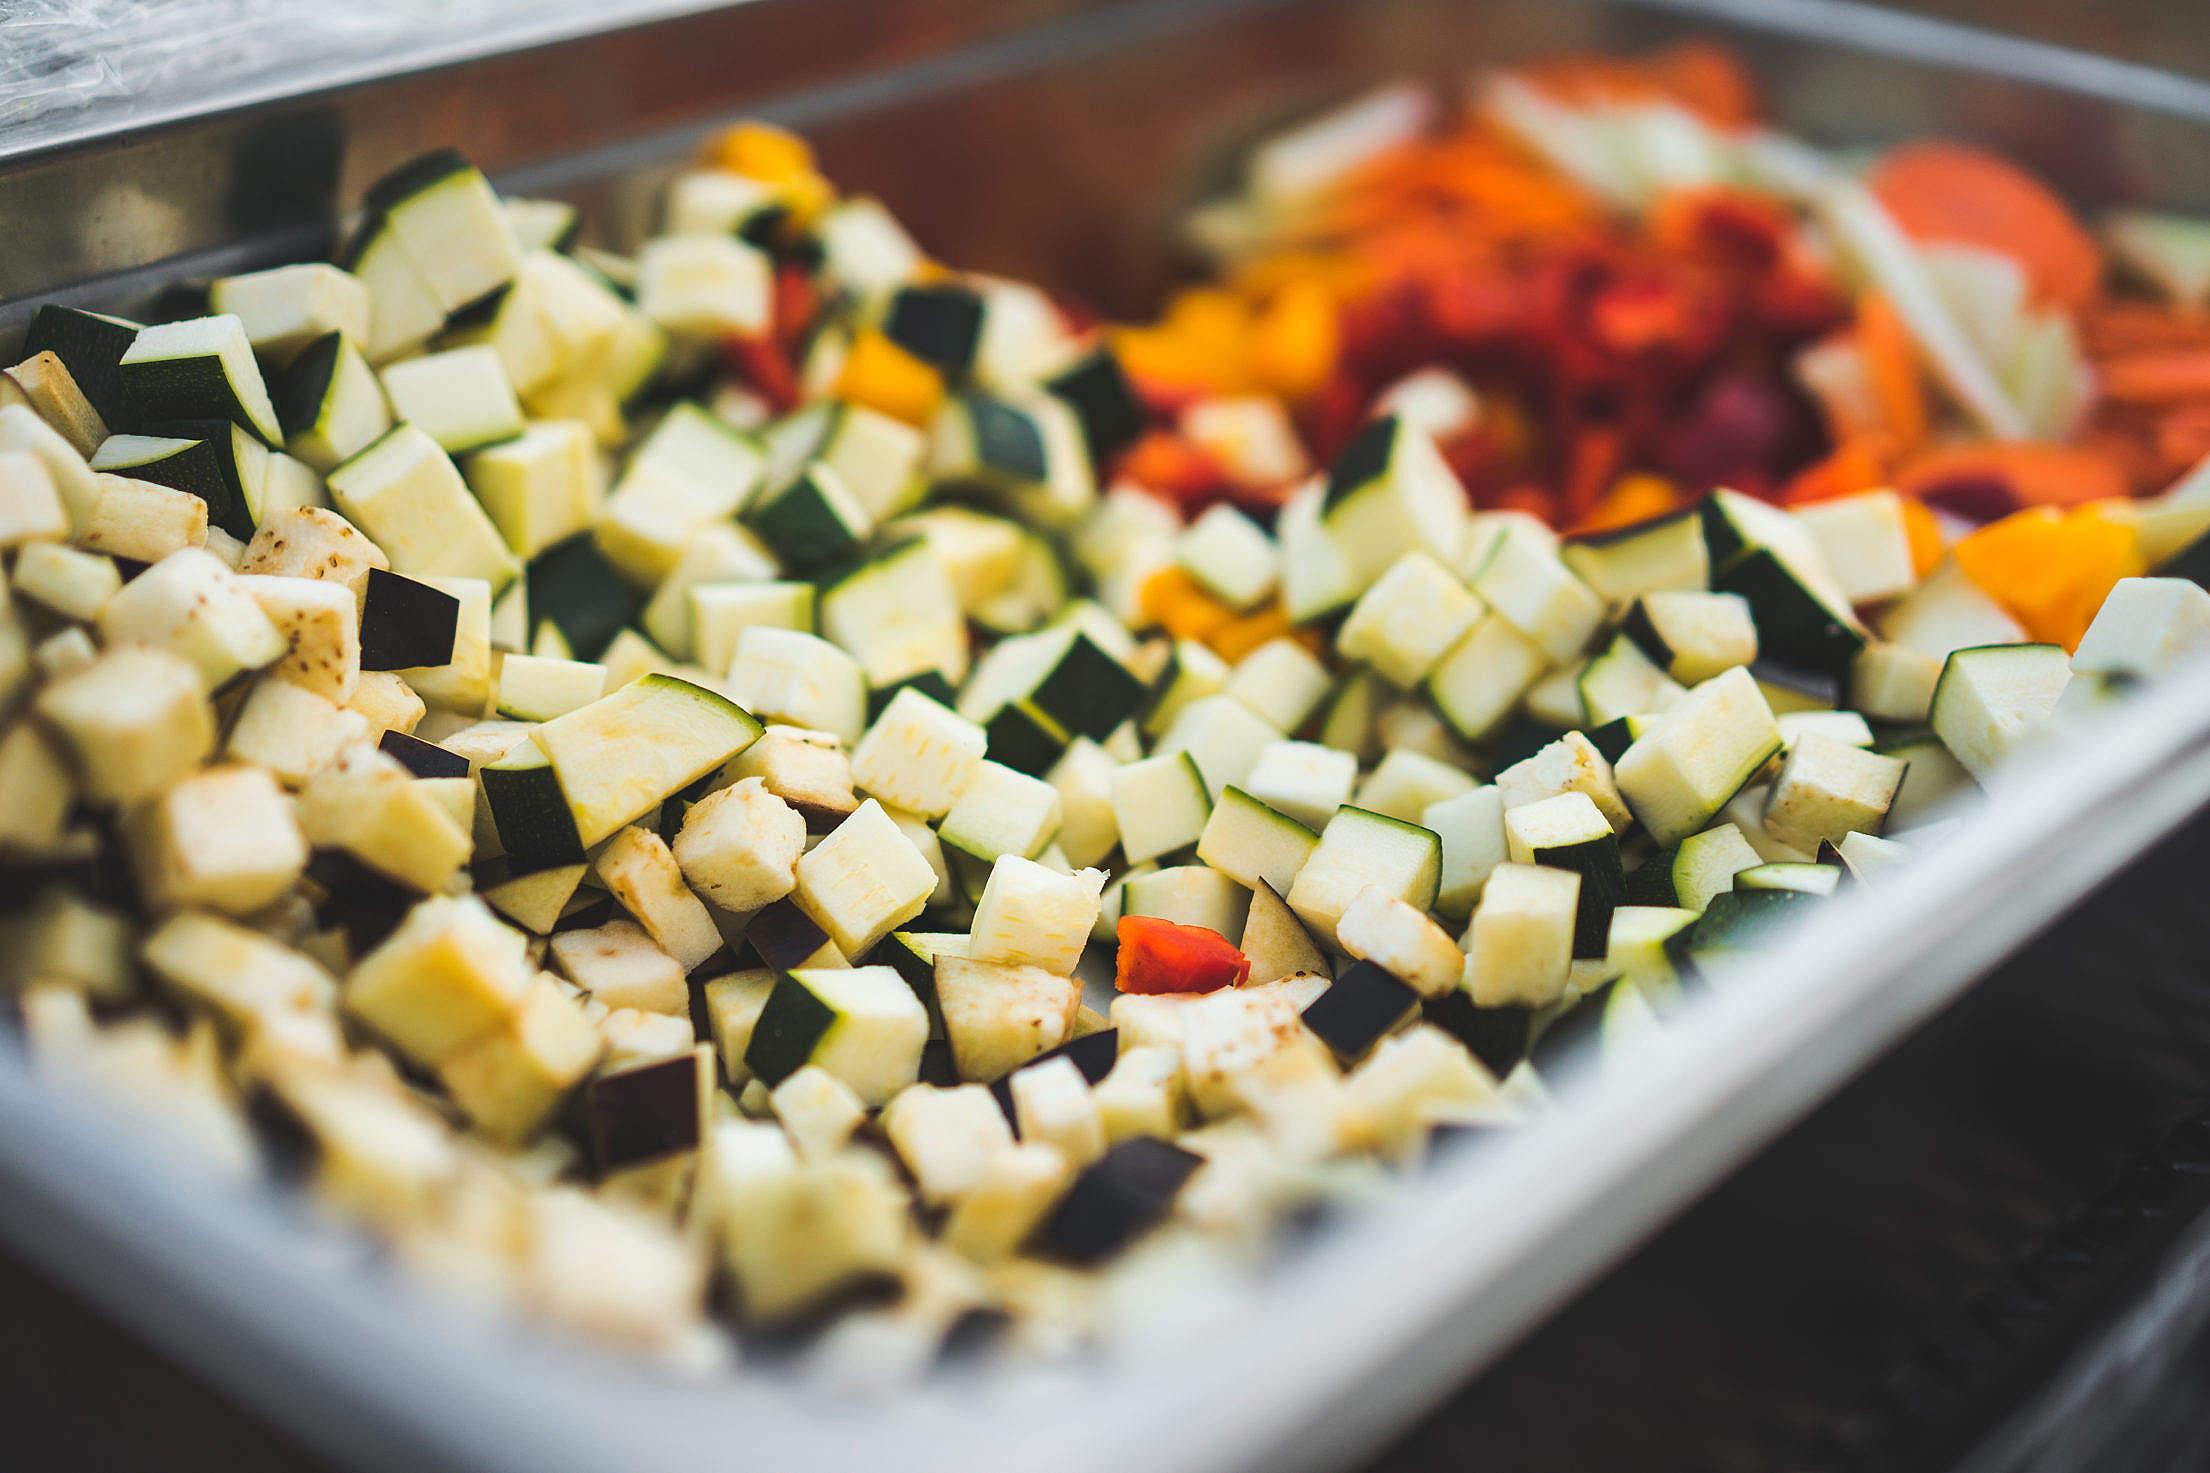 Chopped Vegetable Free Stock Photo